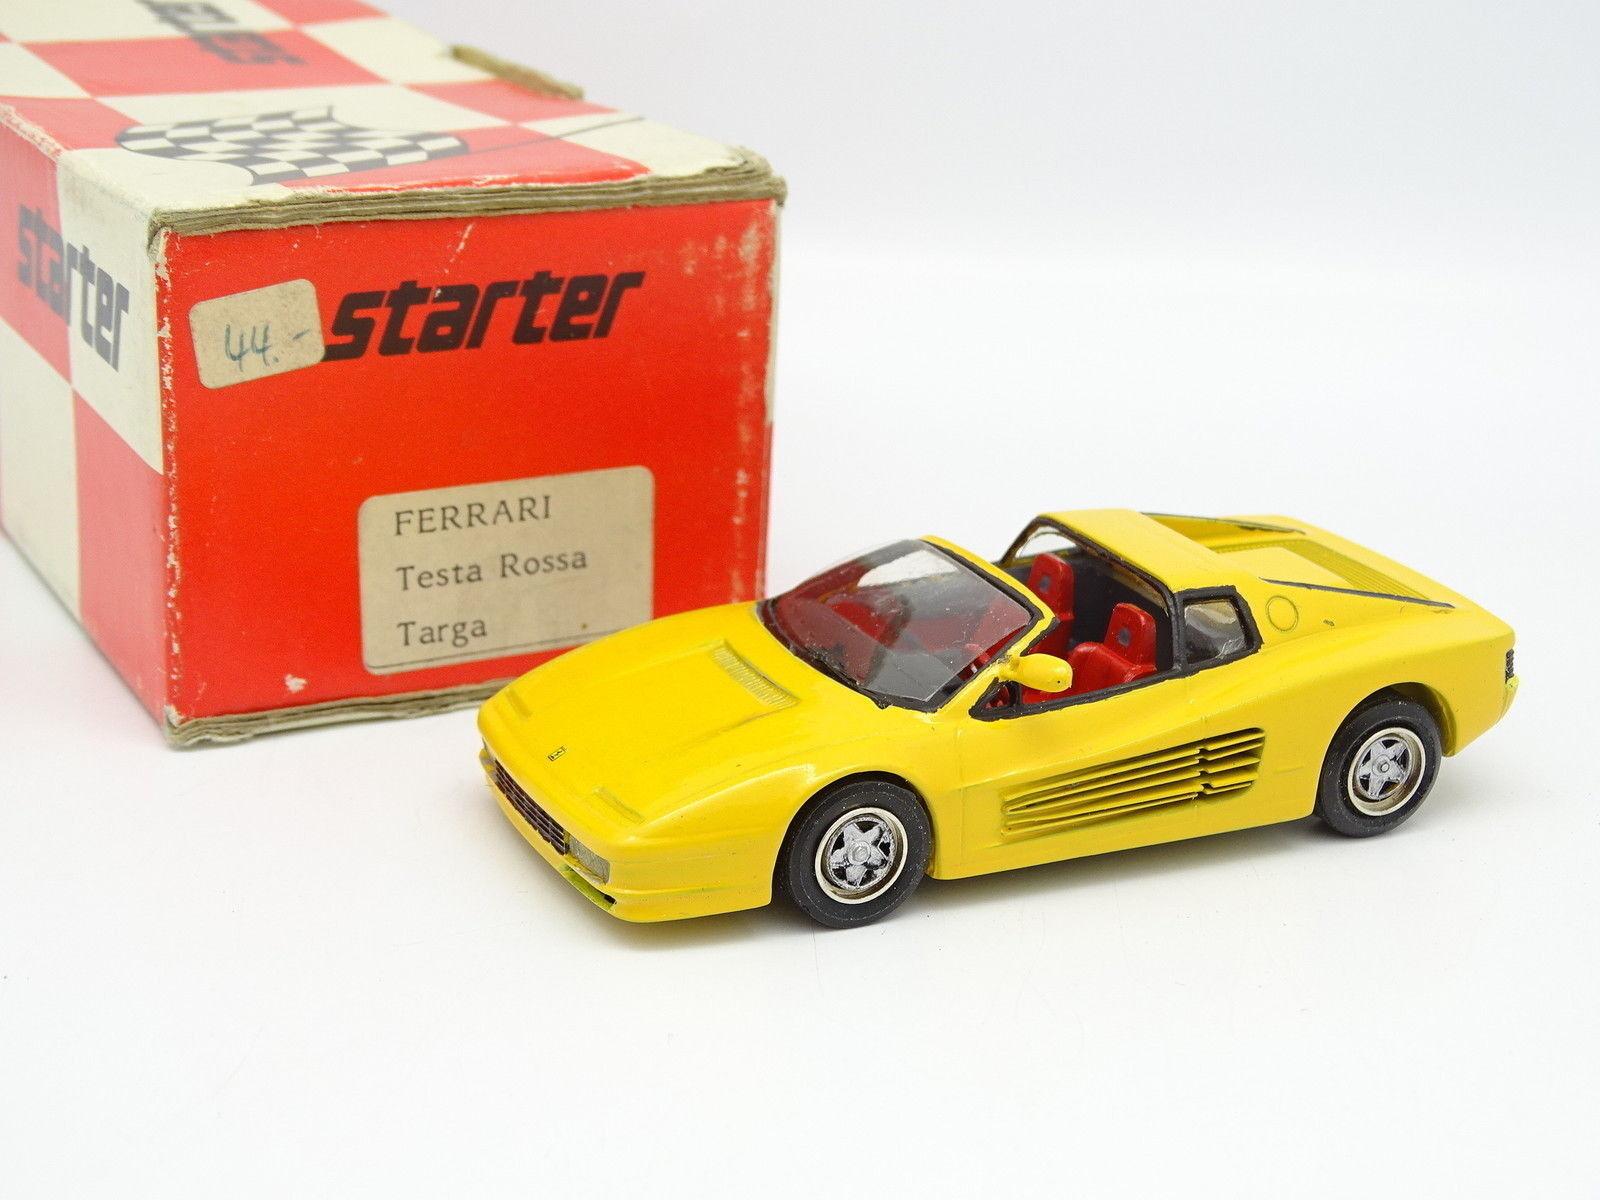 Kit De Inicio Montado 1 43 - Ferrari Testarossa Testarossa Testarossa Targa Amarillo 0b070f